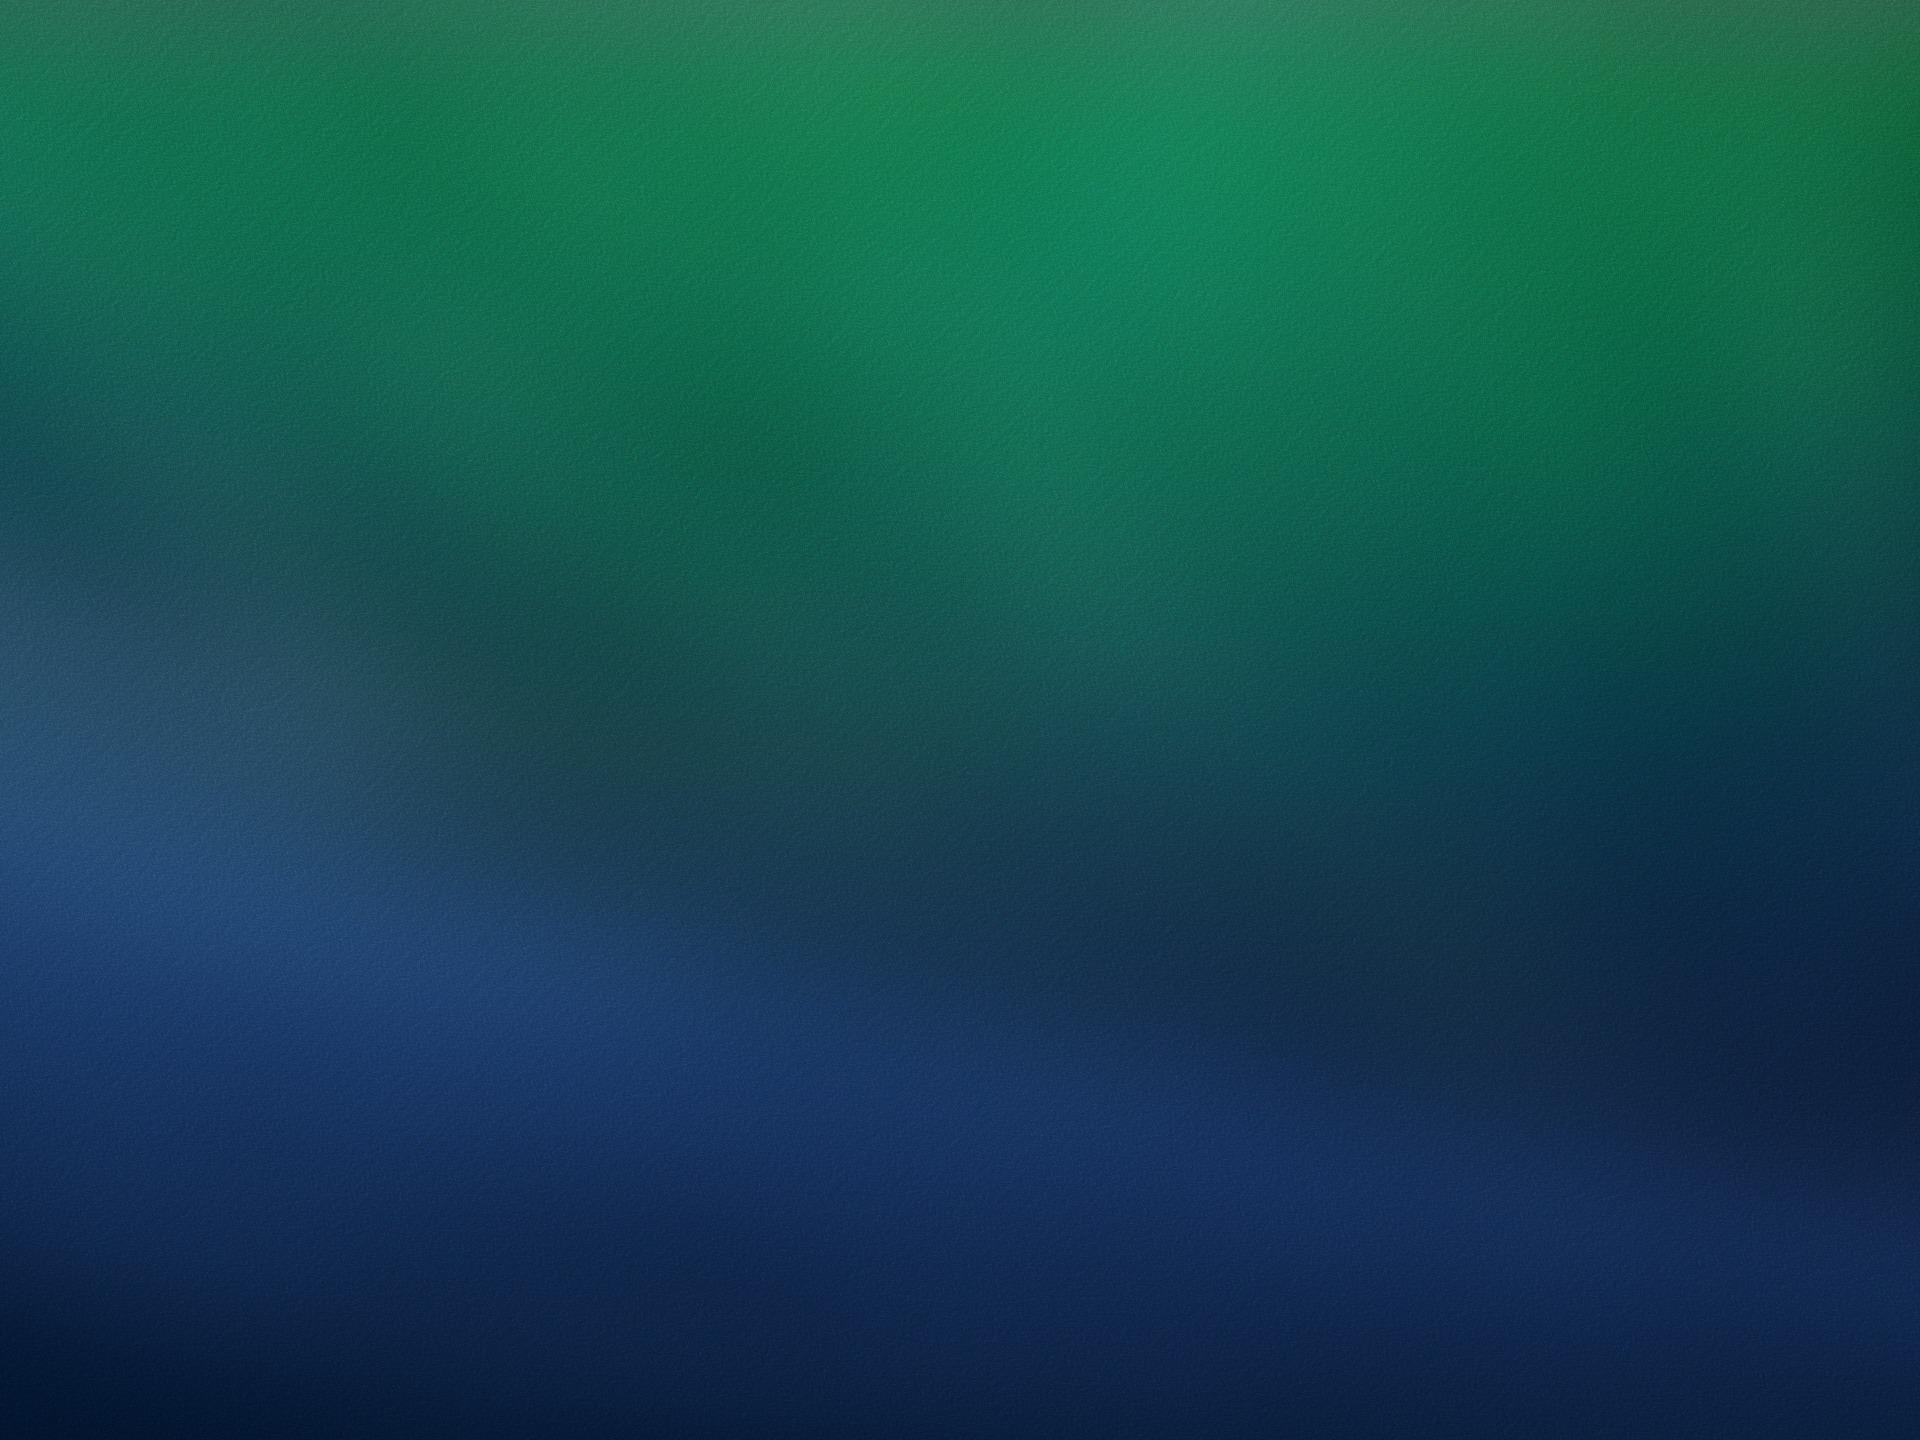 mac os x mavericks hd desktop wallpaper 05 preview | 10wallpaper